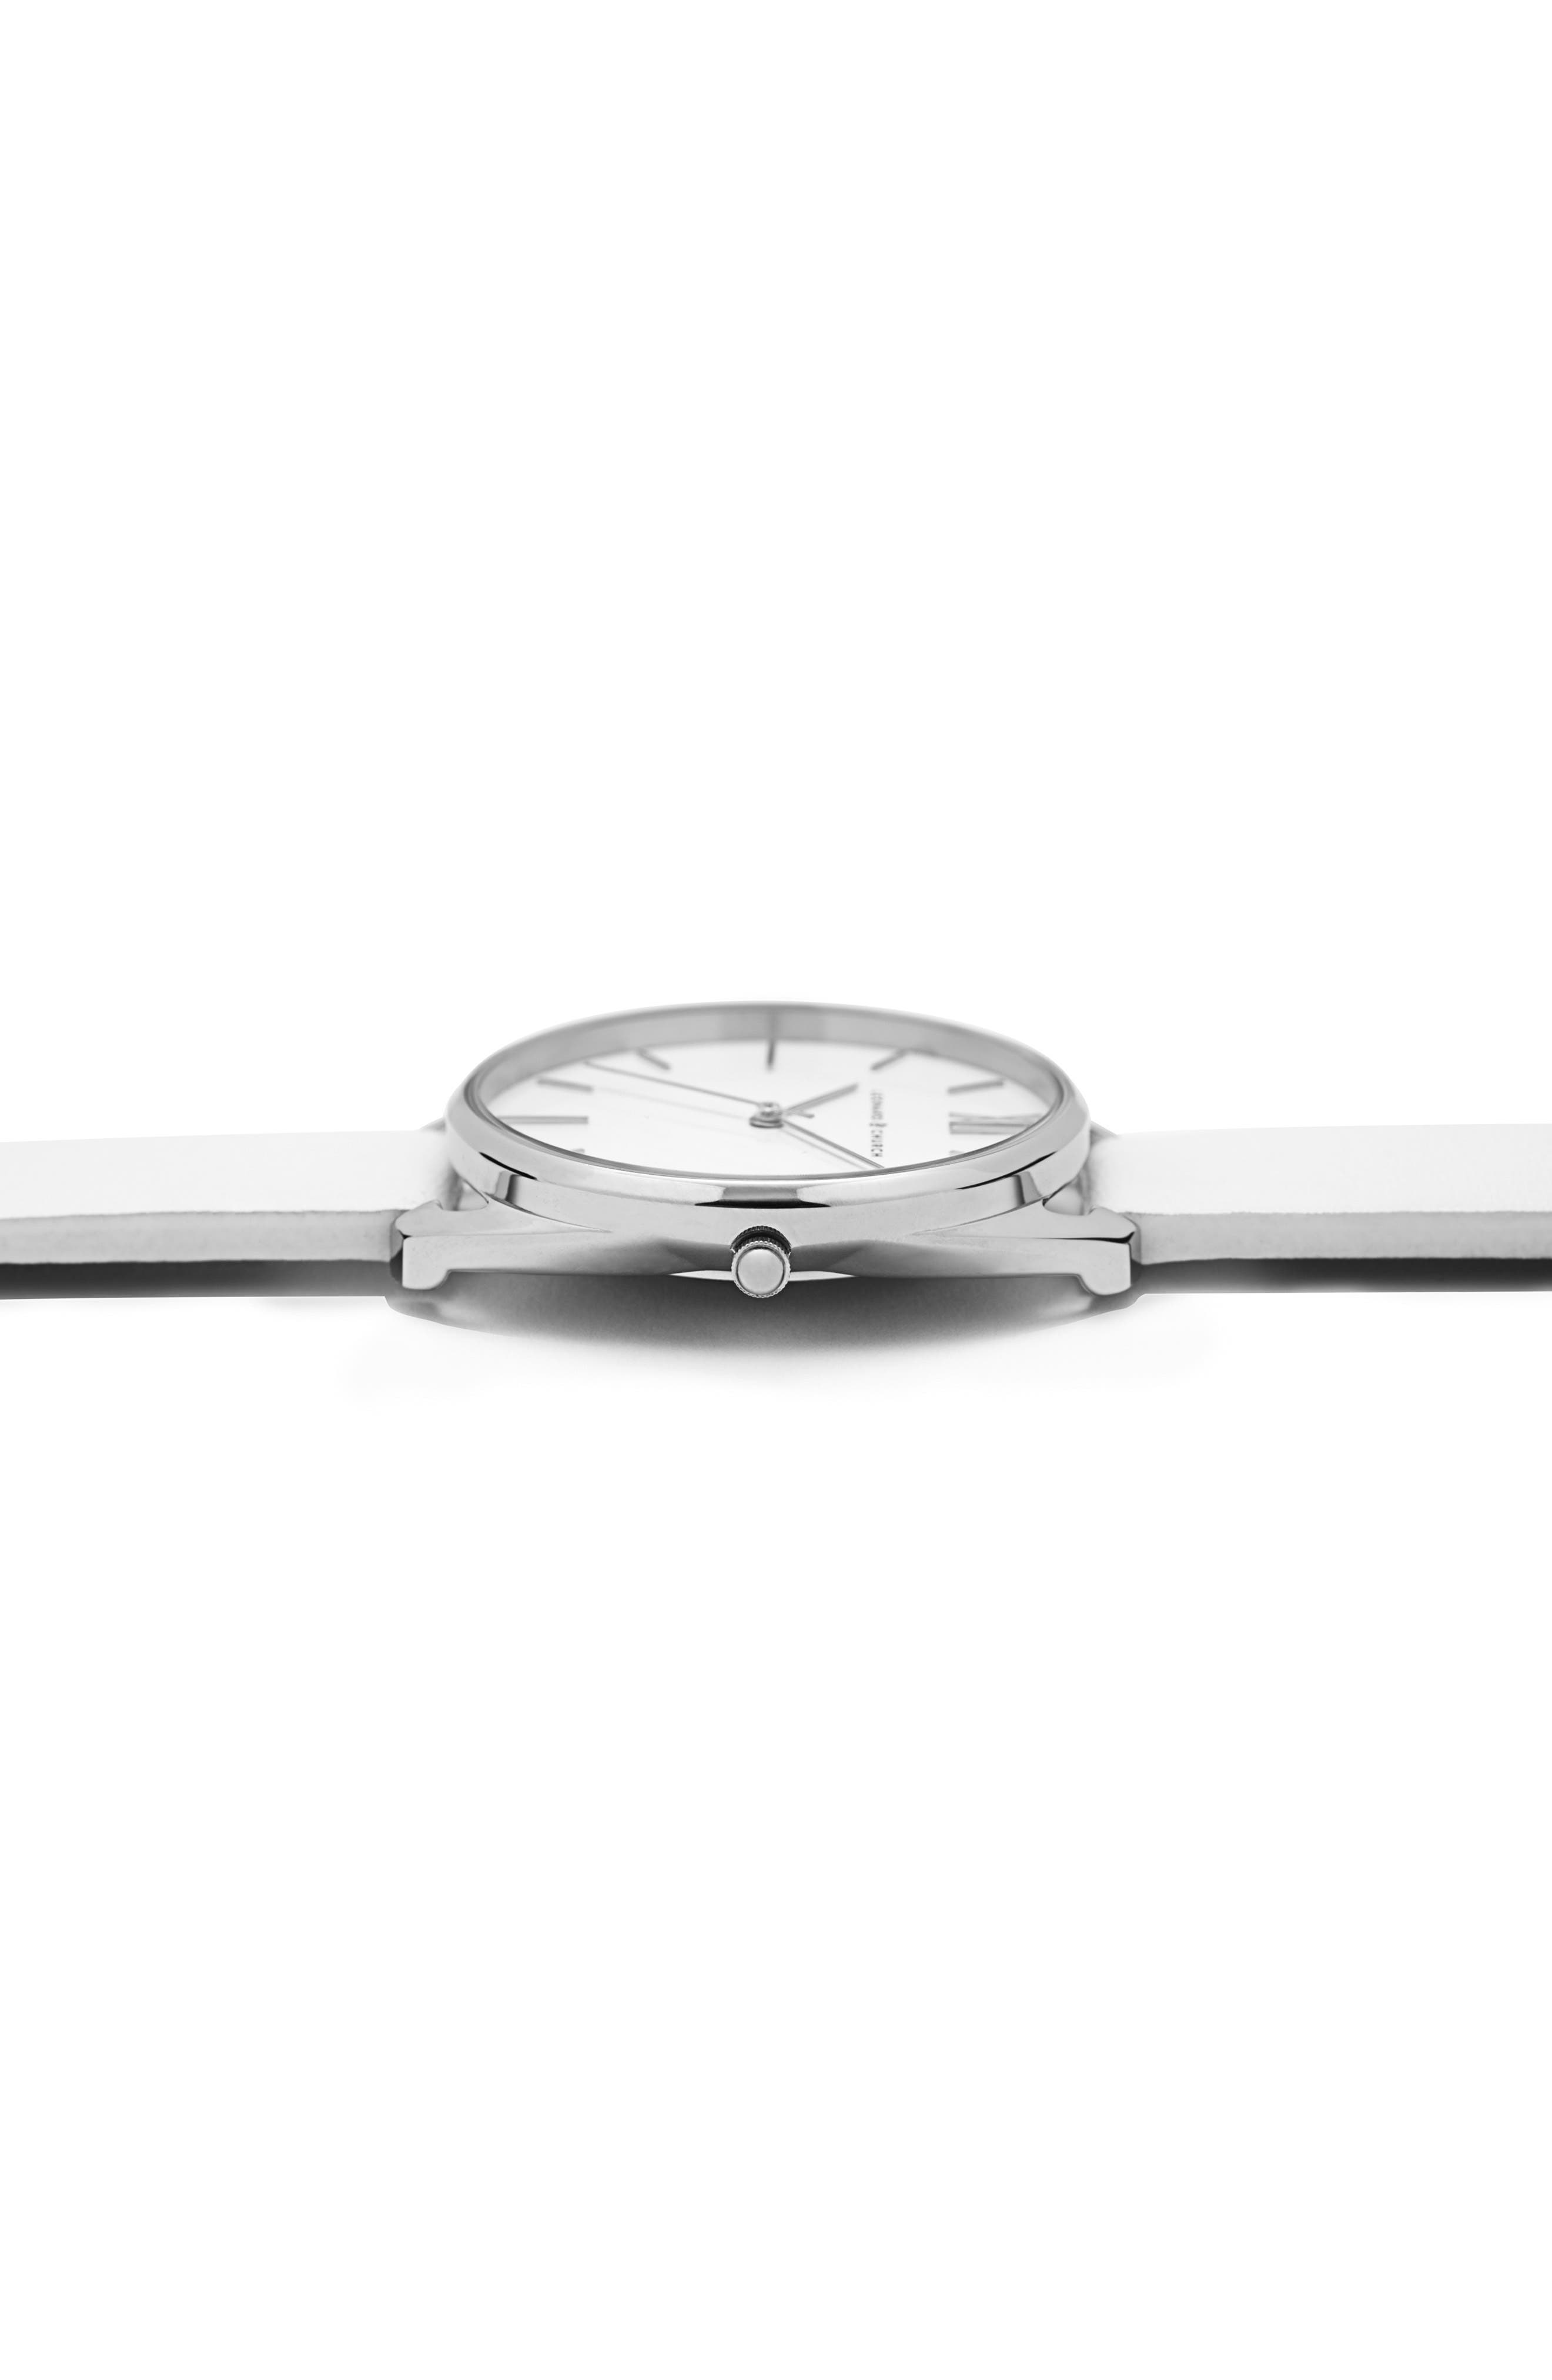 Leonard & Church Chelsea Leather Strap Watch, 34mm,                             Alternate thumbnail 14, color,